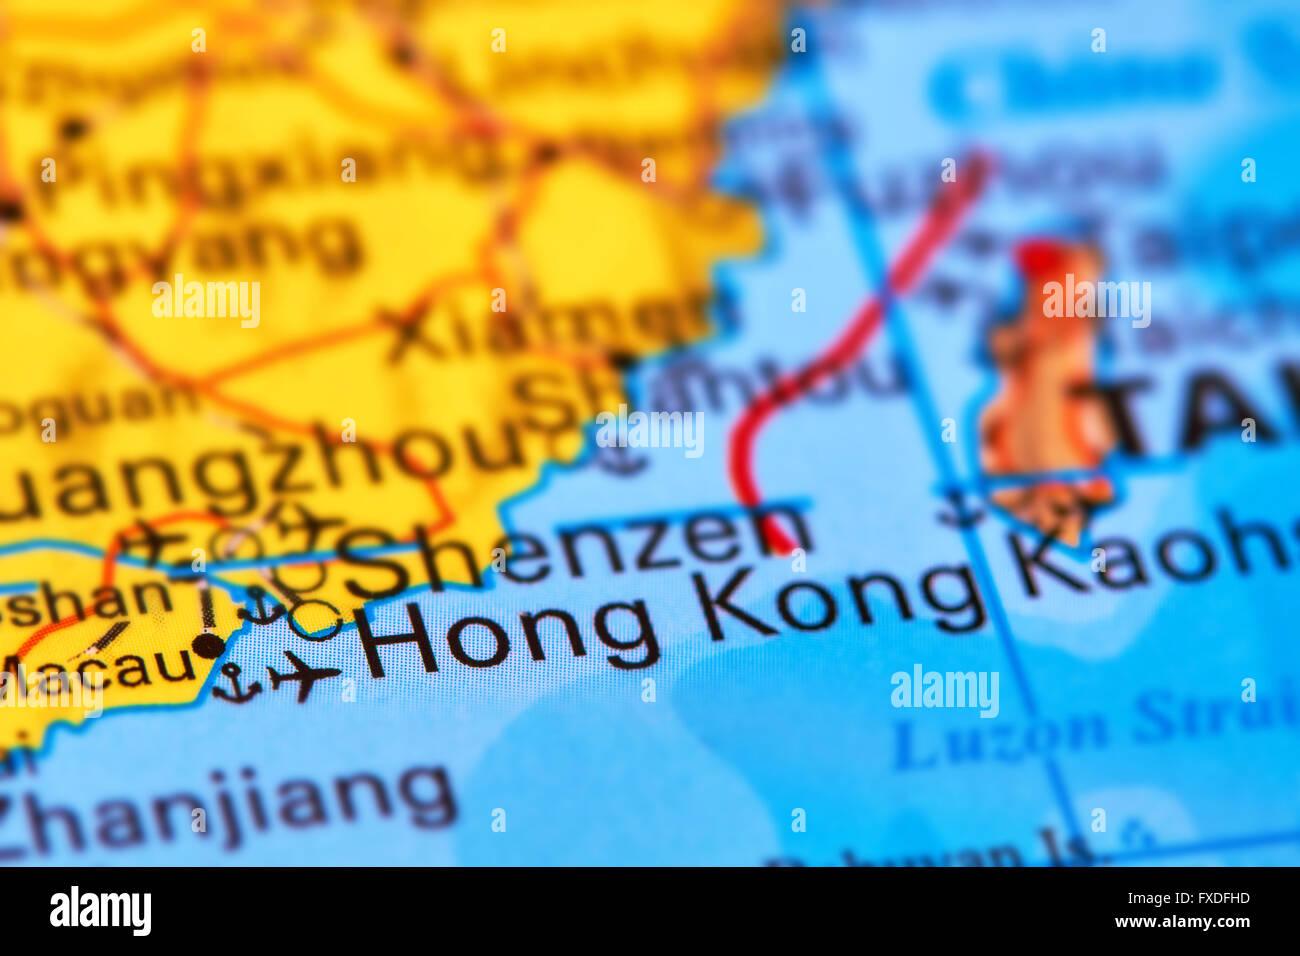 Hong Kong City in China on the World Map Stock Photo Royalty